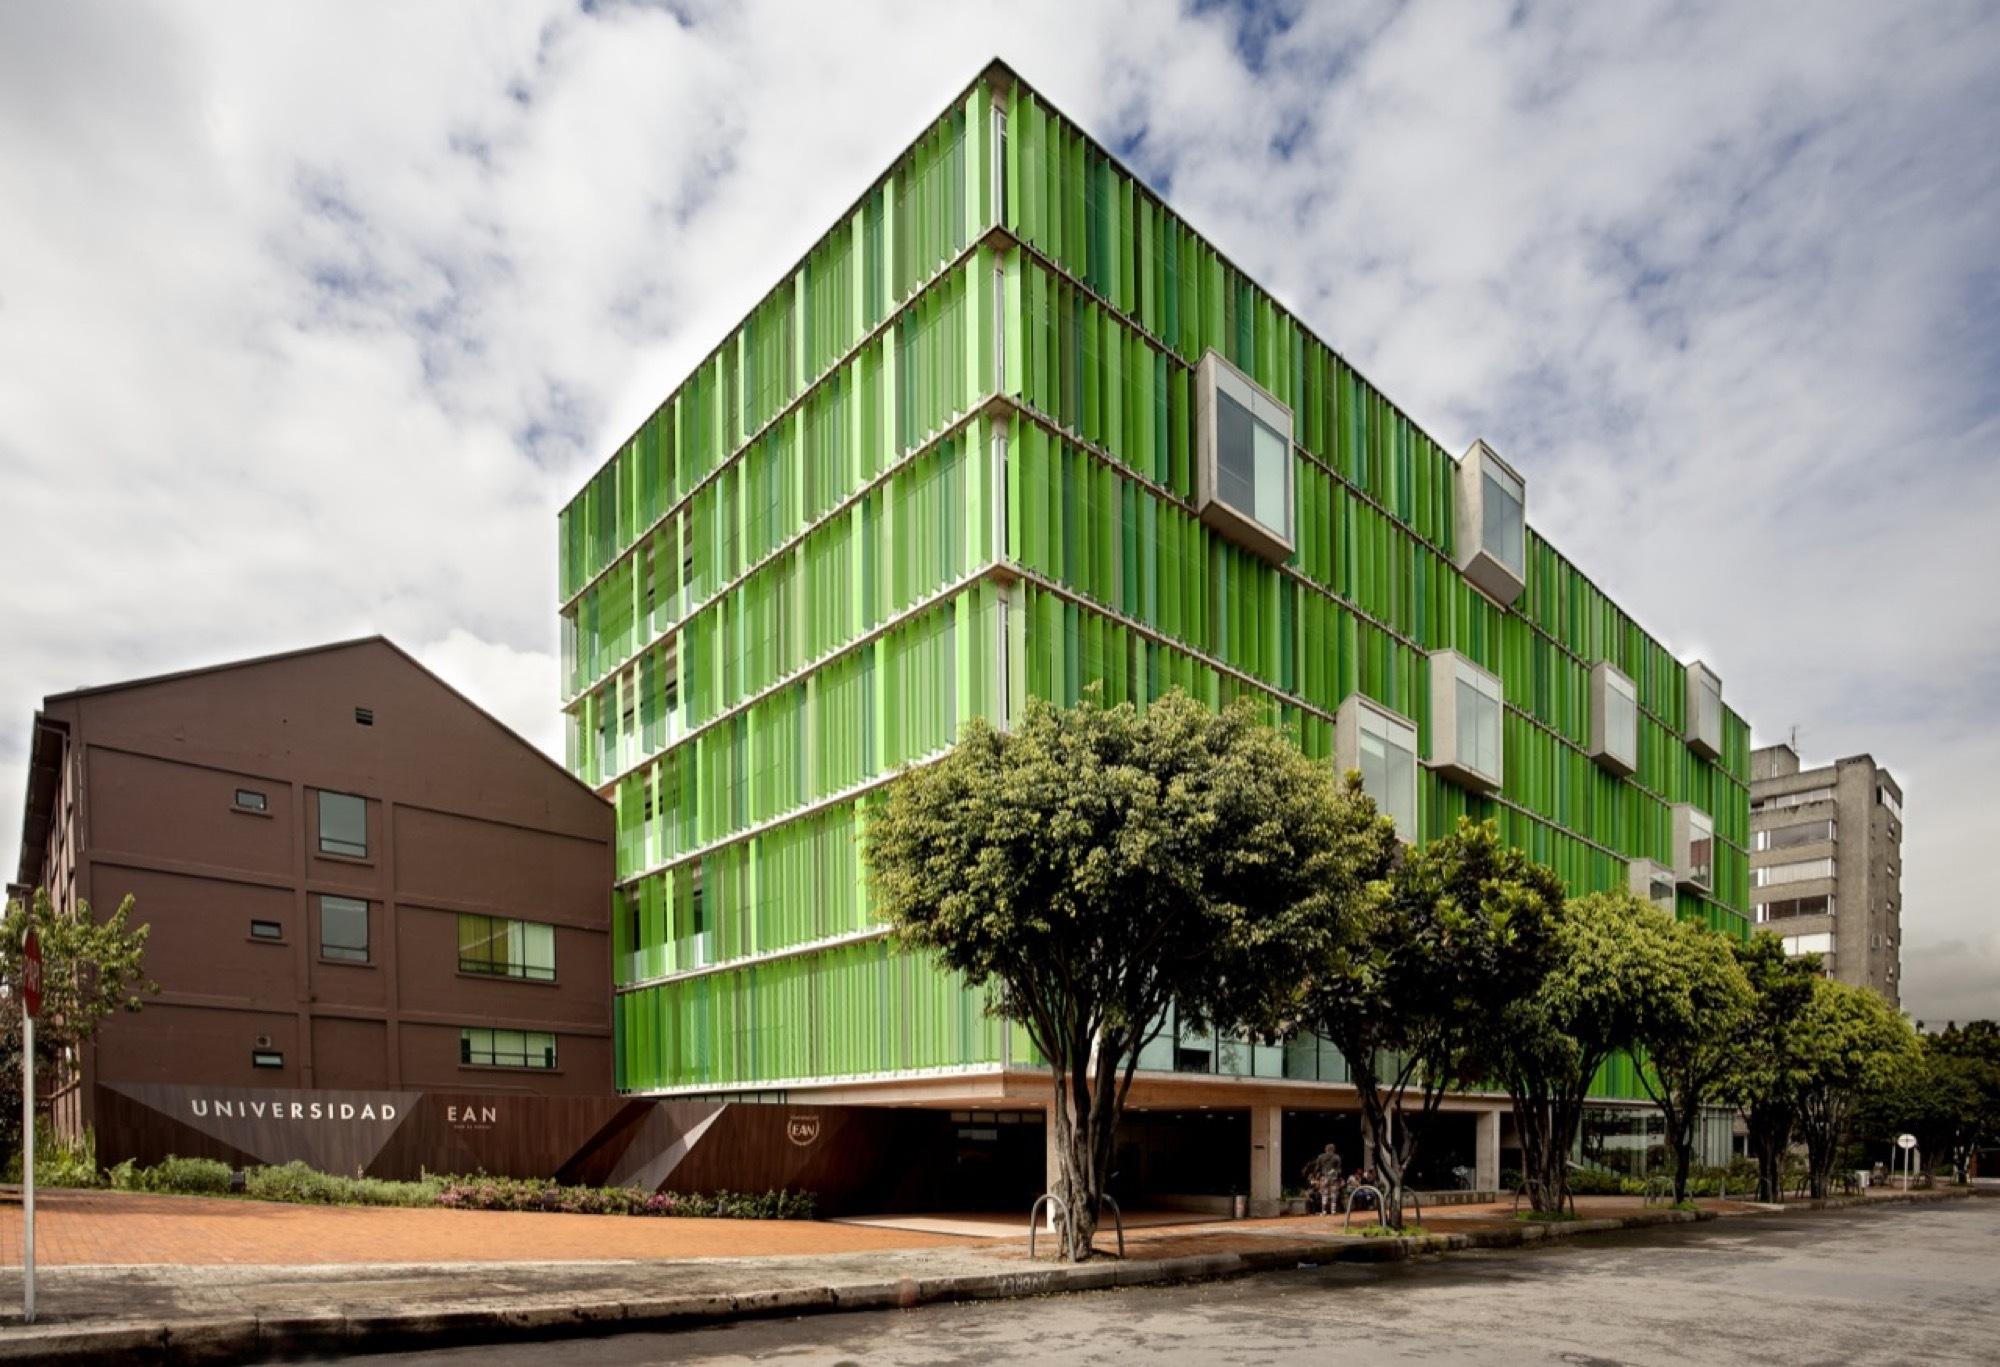 Gallery of ean university daniel bonilla marcela for Arquitecto universidad